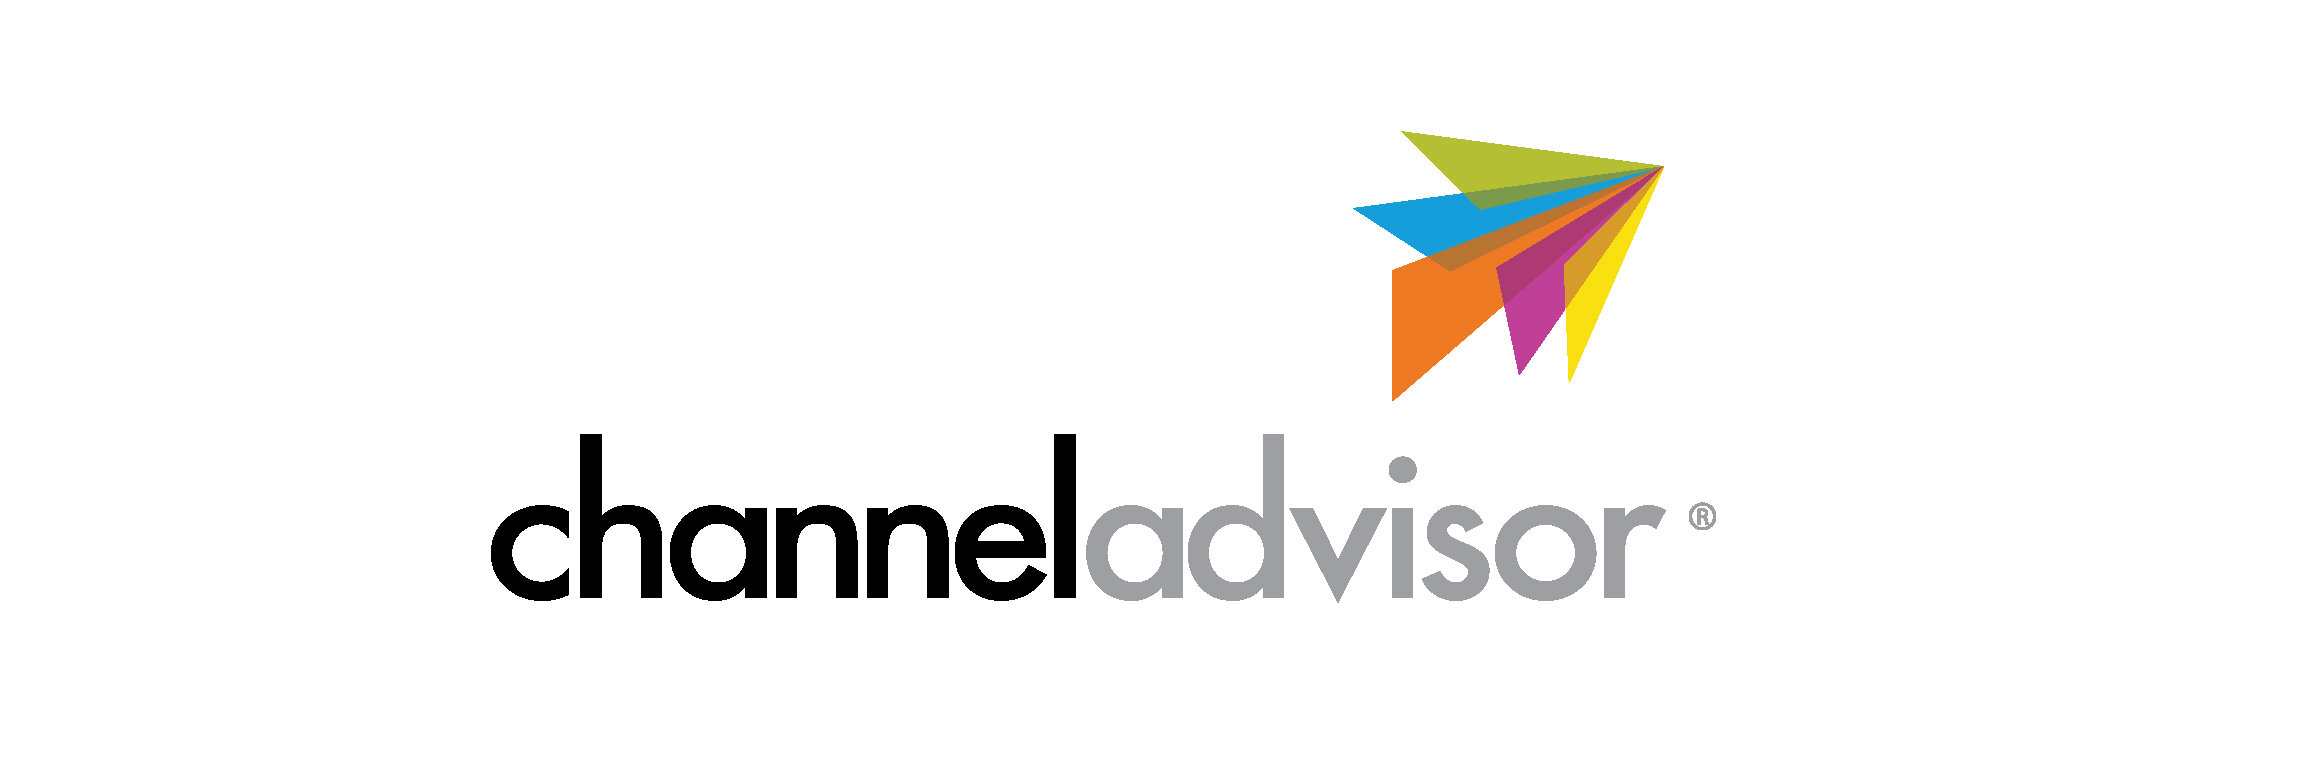 ChannelAdvisor   TechIreland